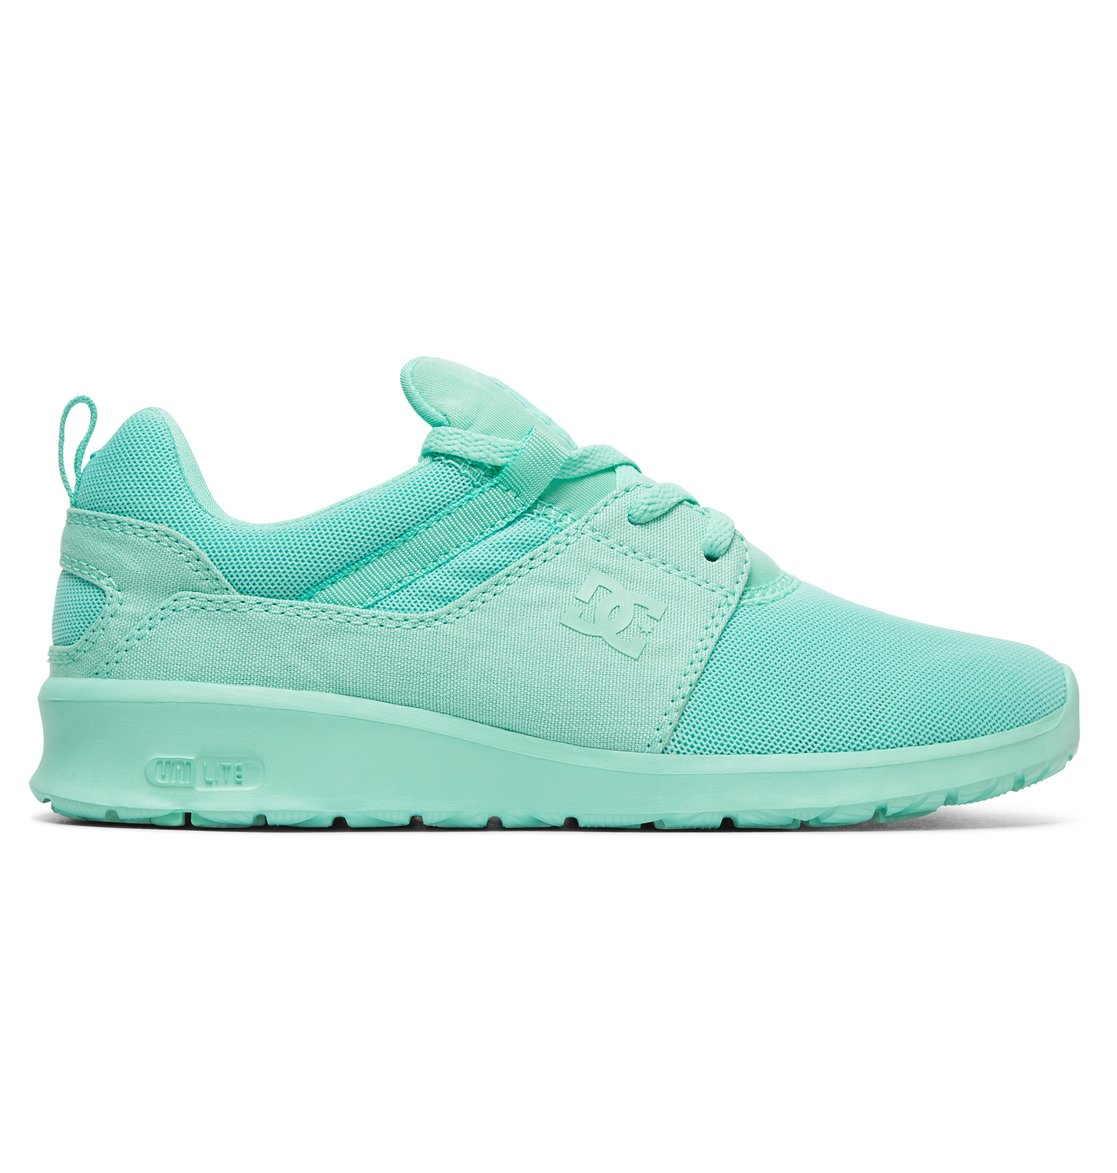 DC Shoes Heathrow TX SE, Zapatillas para Mujer, Beige (Taupe TAU), 39 EU